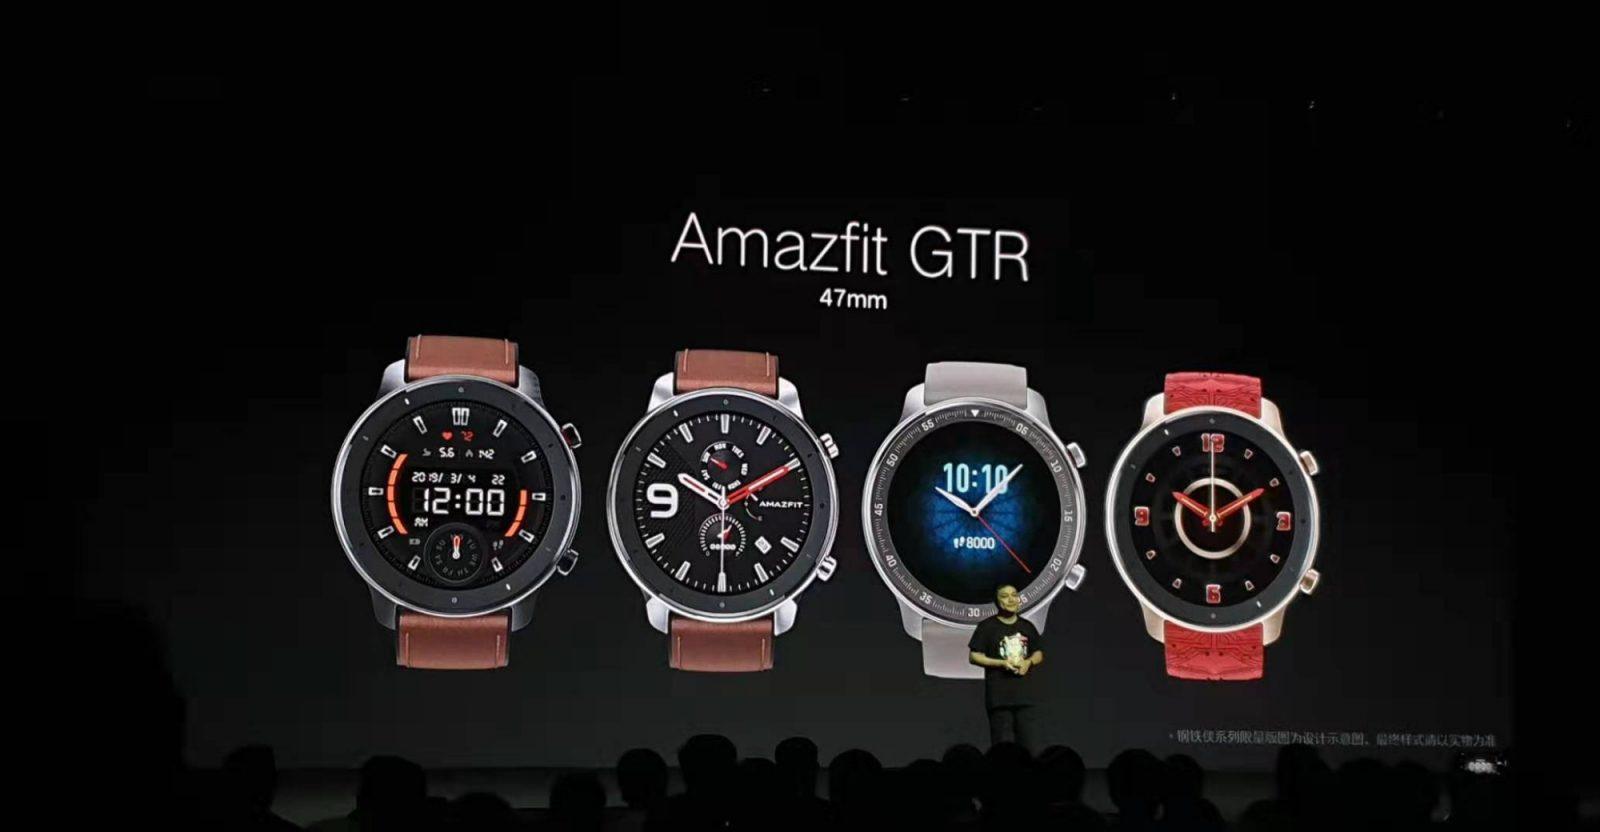 Bemutatkozott az Amazfit GTR 2